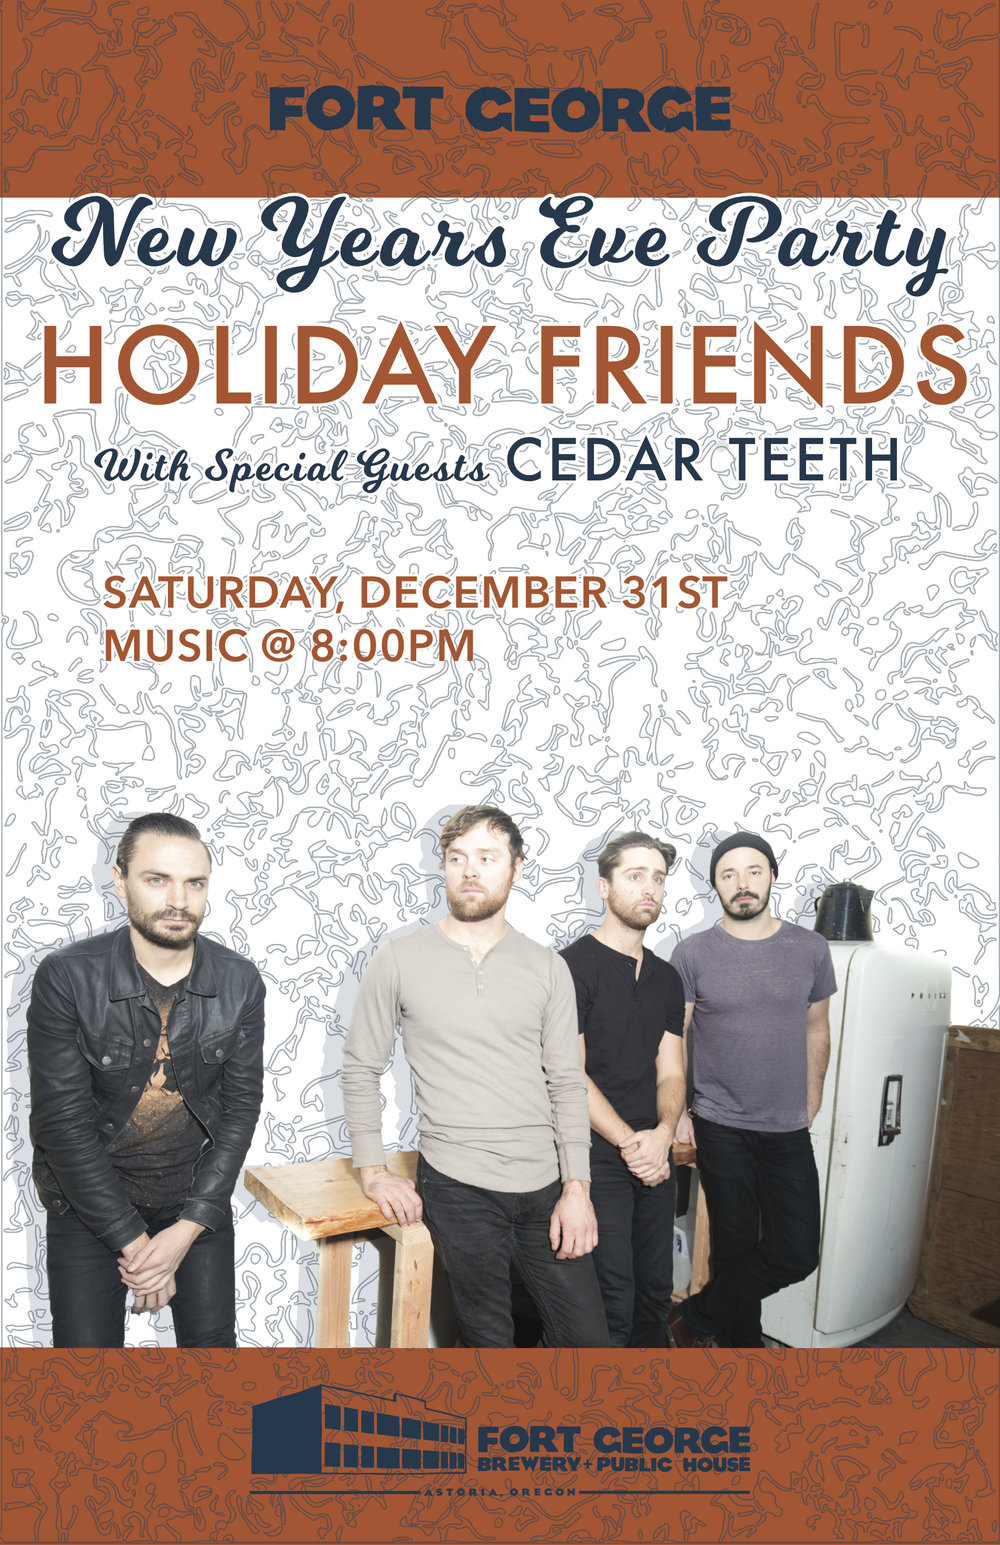 holidayfriends_cedarteeth.jpg